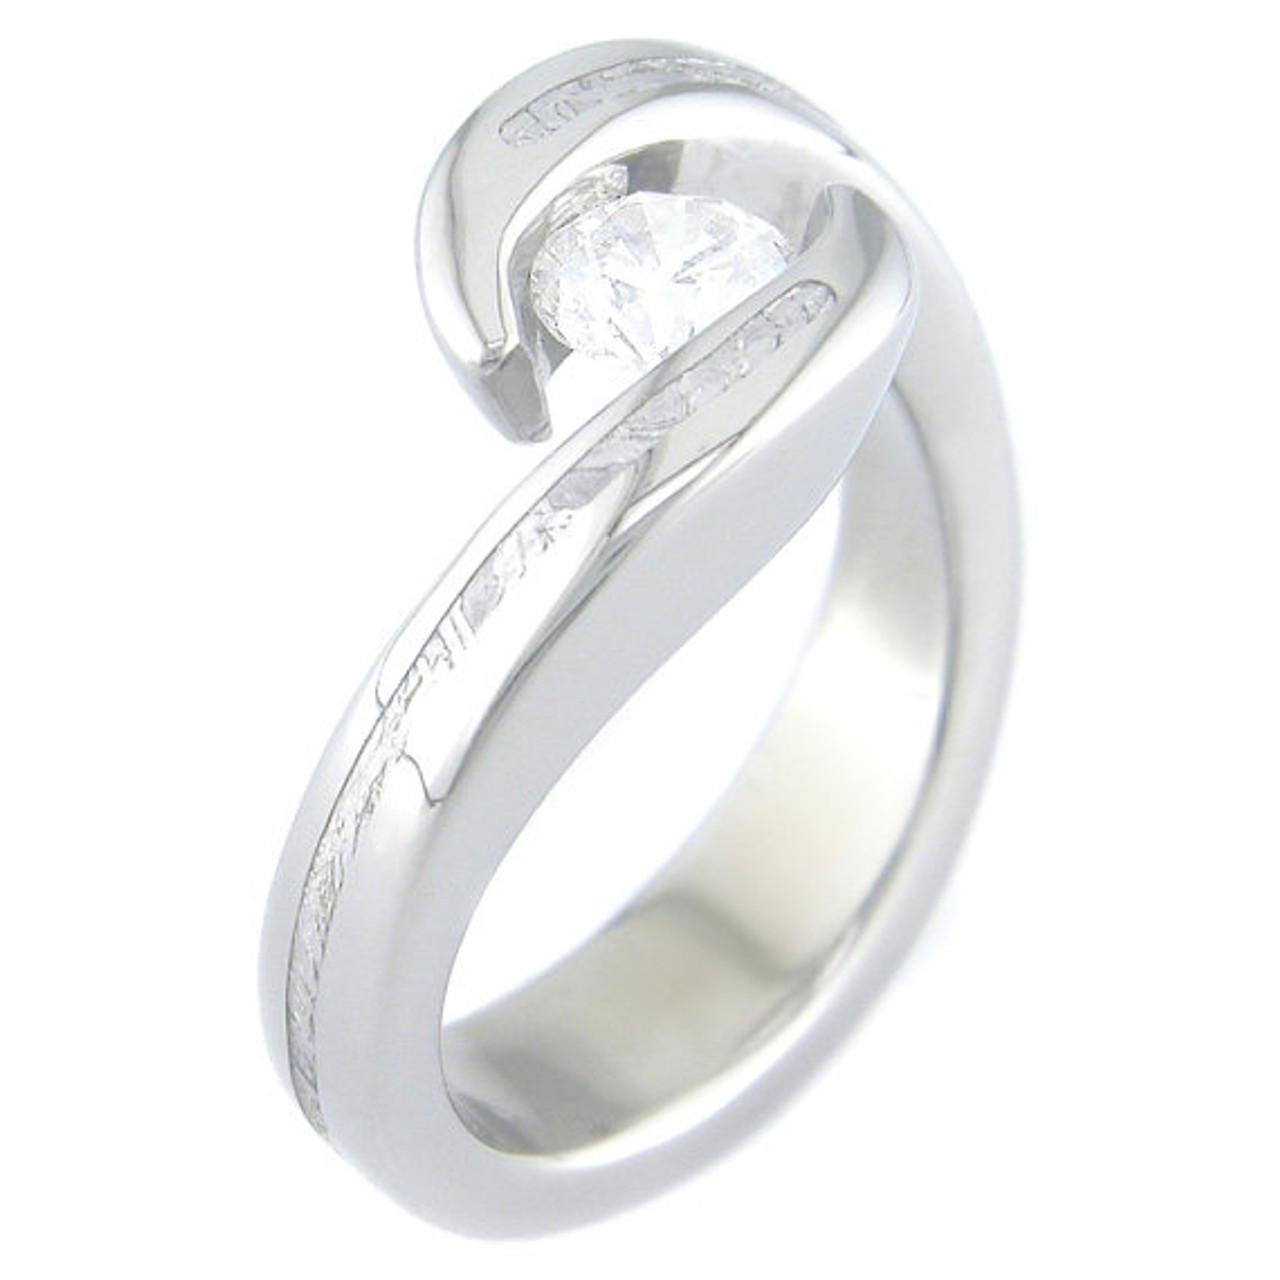 69d4f63f5fee9 Women's Twisted Titanium Tension Set Stone Gibeon Meteorite Ring